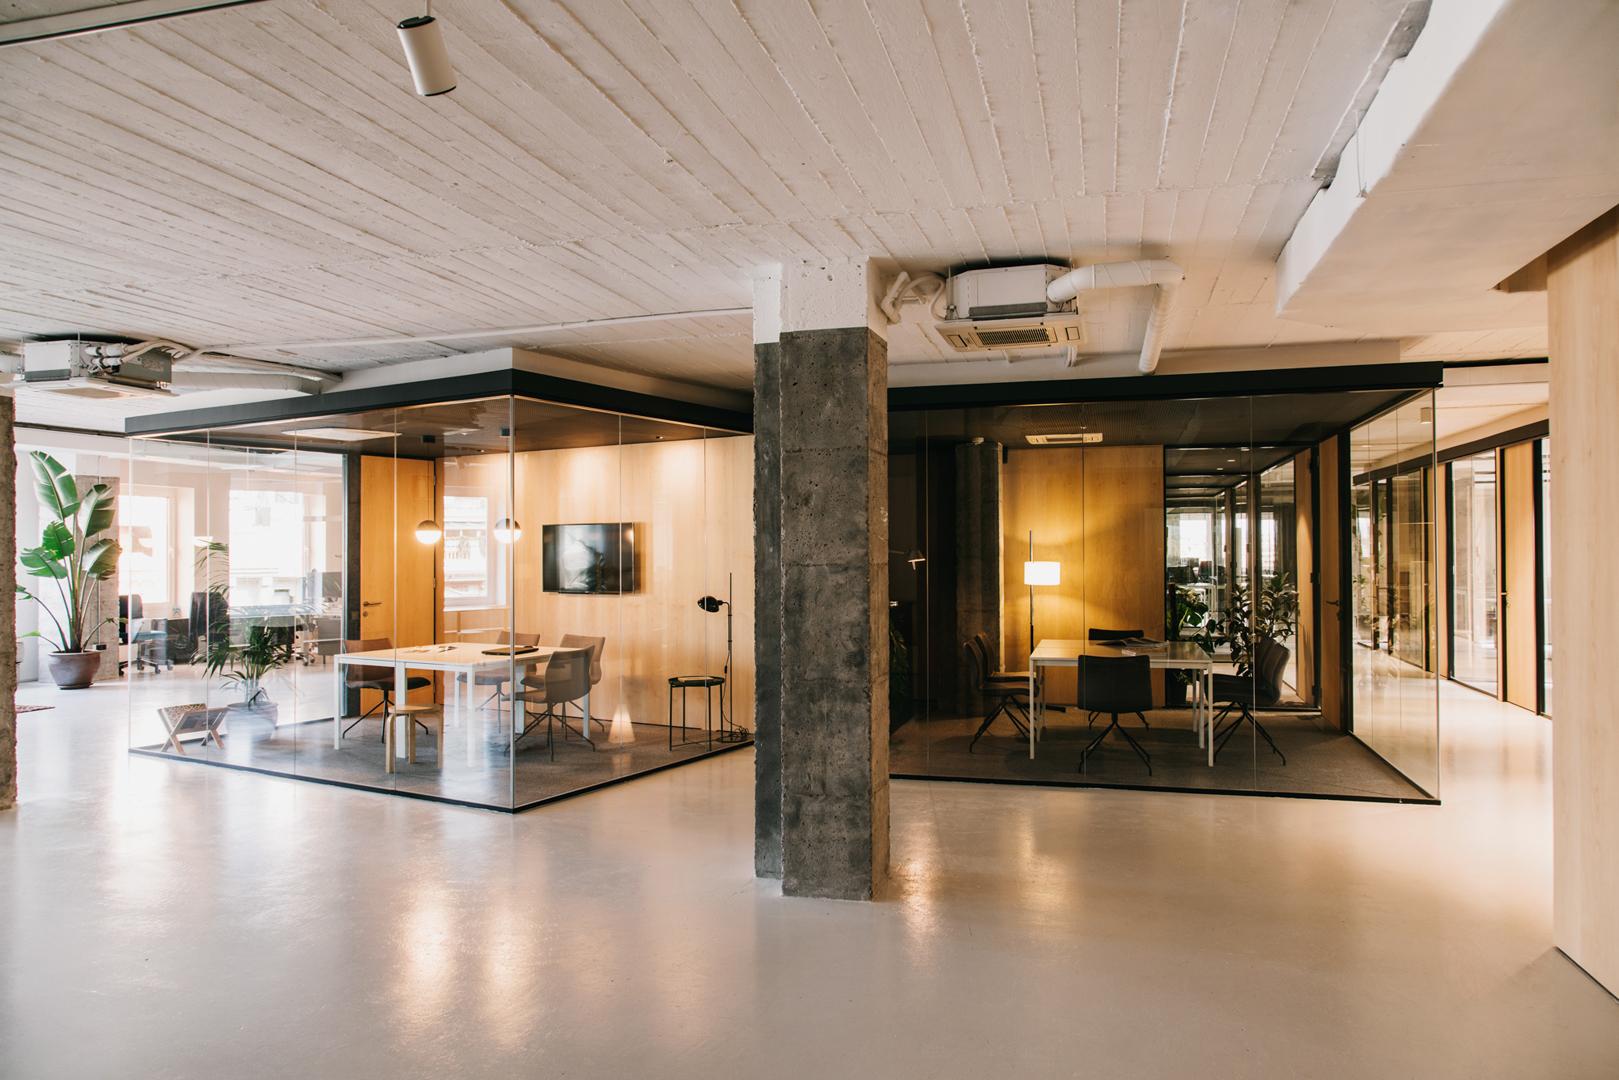 Mesura cloud coworking hic arquitectura for Booking barcelona oficinas